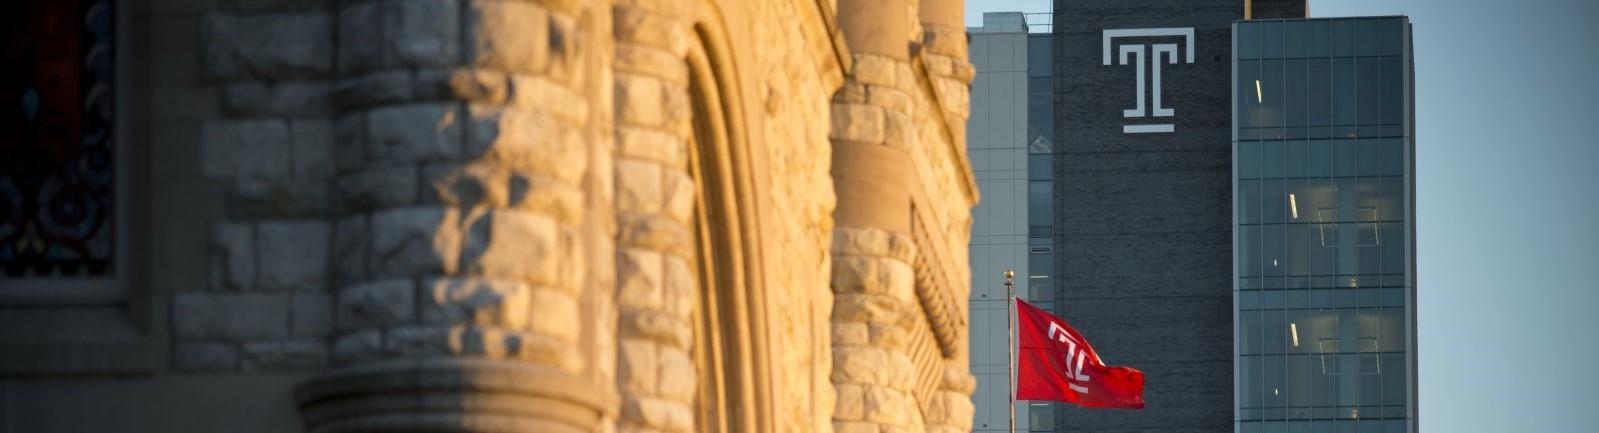 A Temple University building rises up behind a storied Philadelphia building.